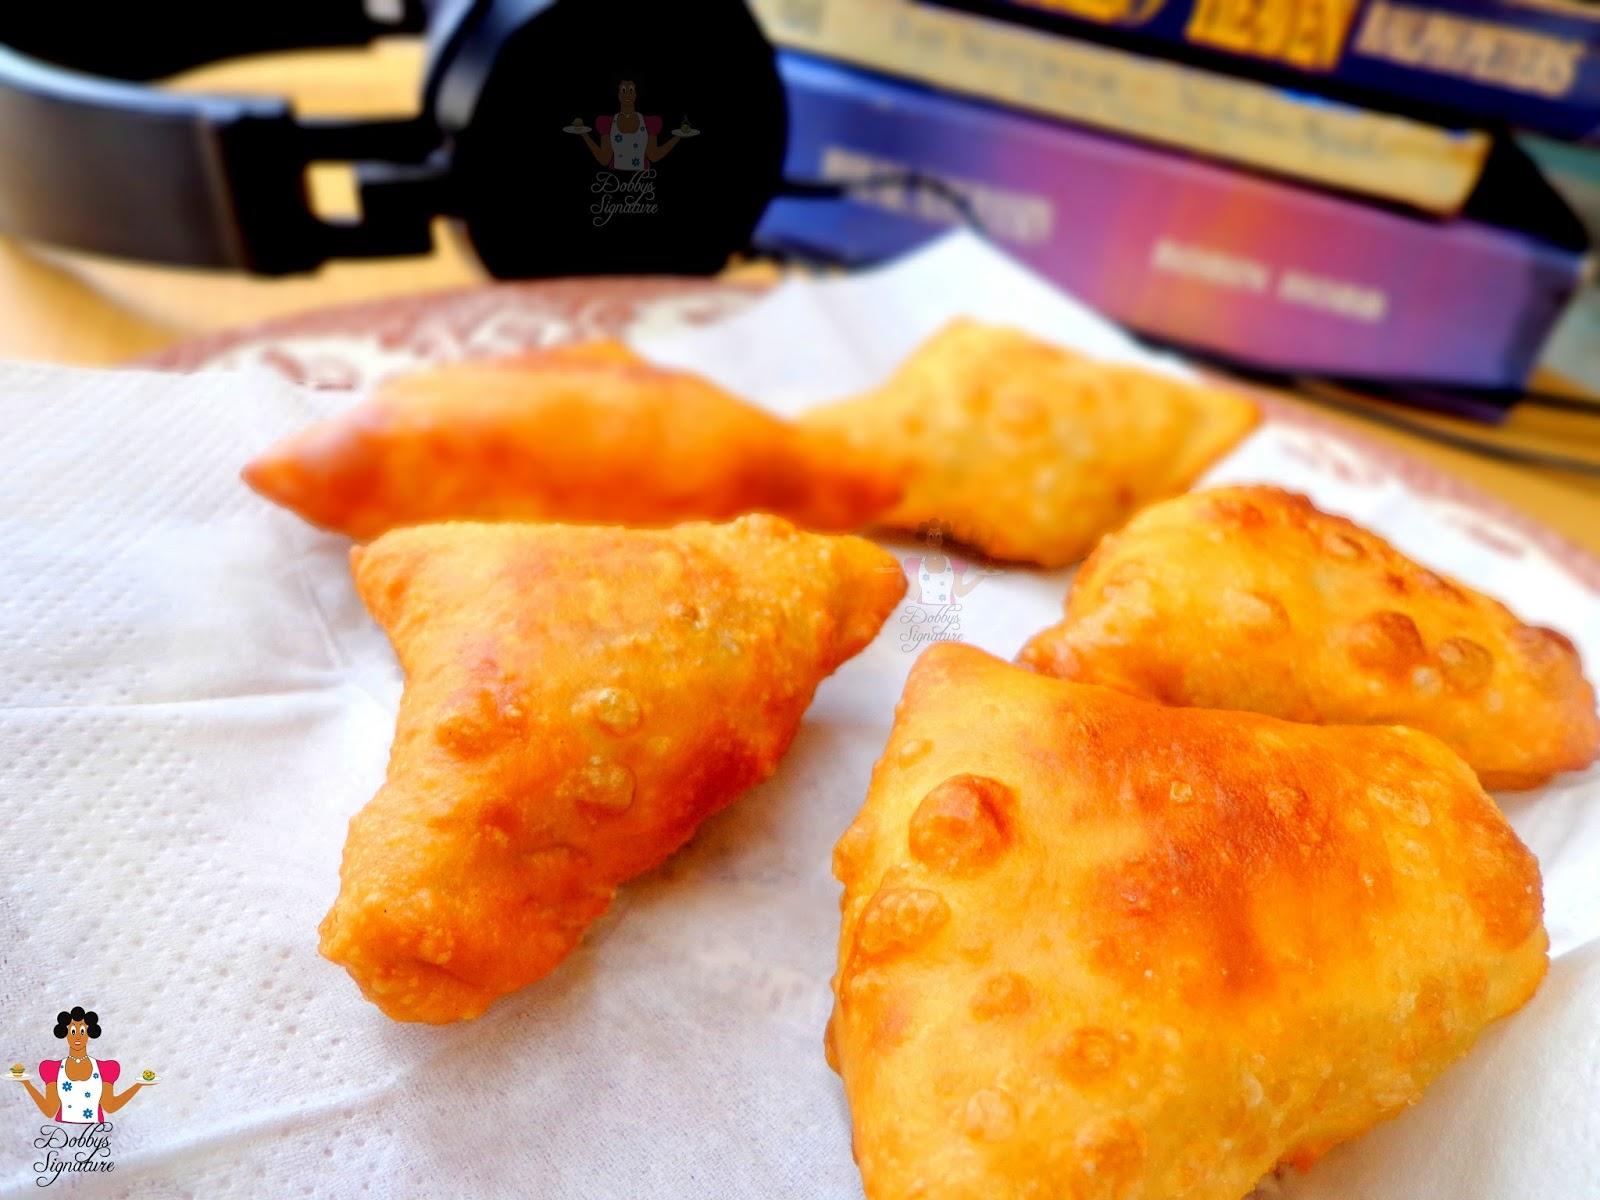 Dobbys signature nigerian food blog i nigerian food recipes i nigerian samosa recipe forumfinder Images